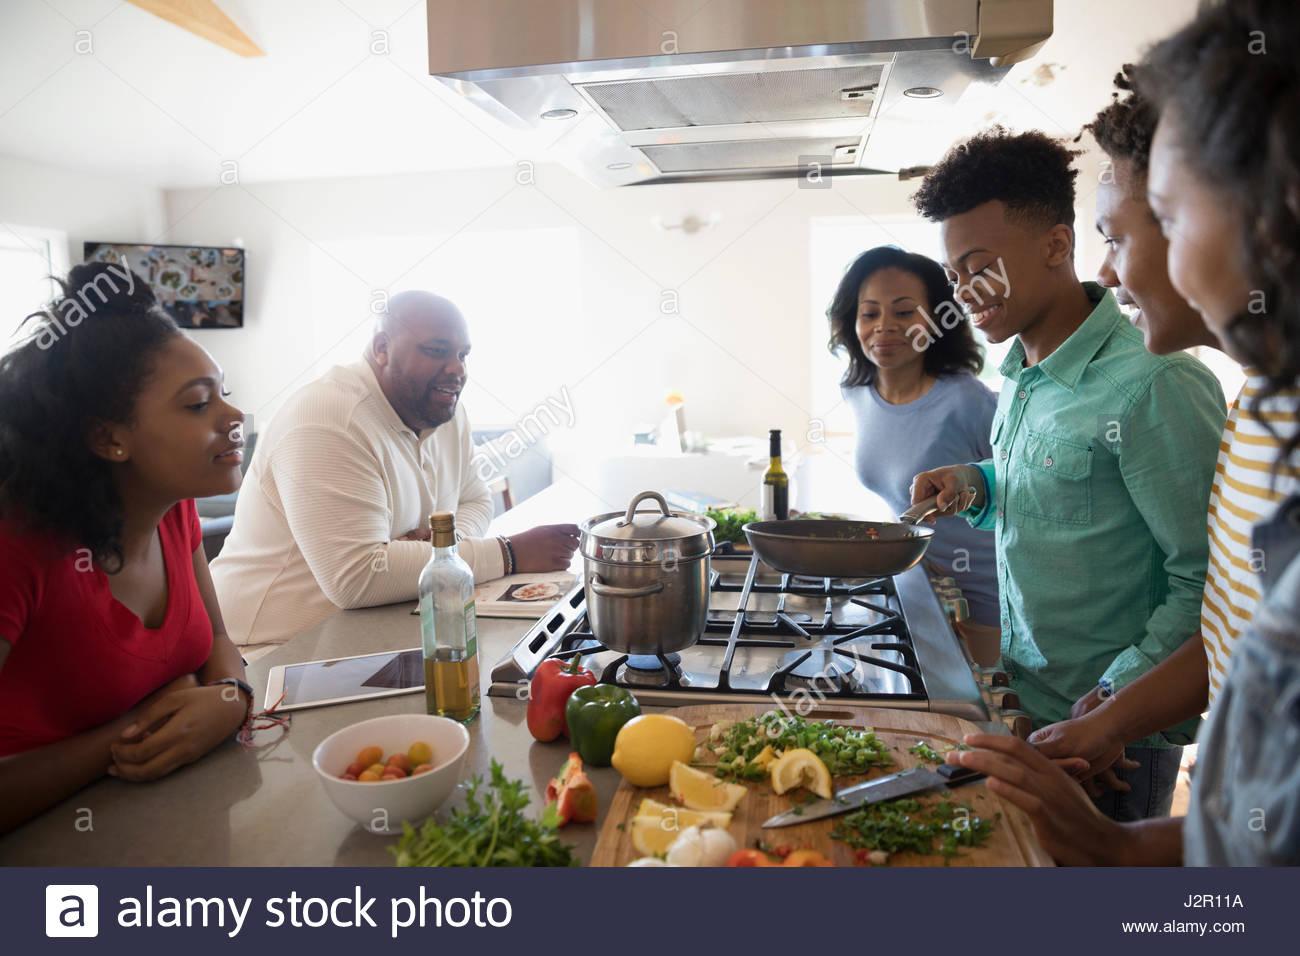 Famiglia americana africana per la cottura in cucina Immagini Stock